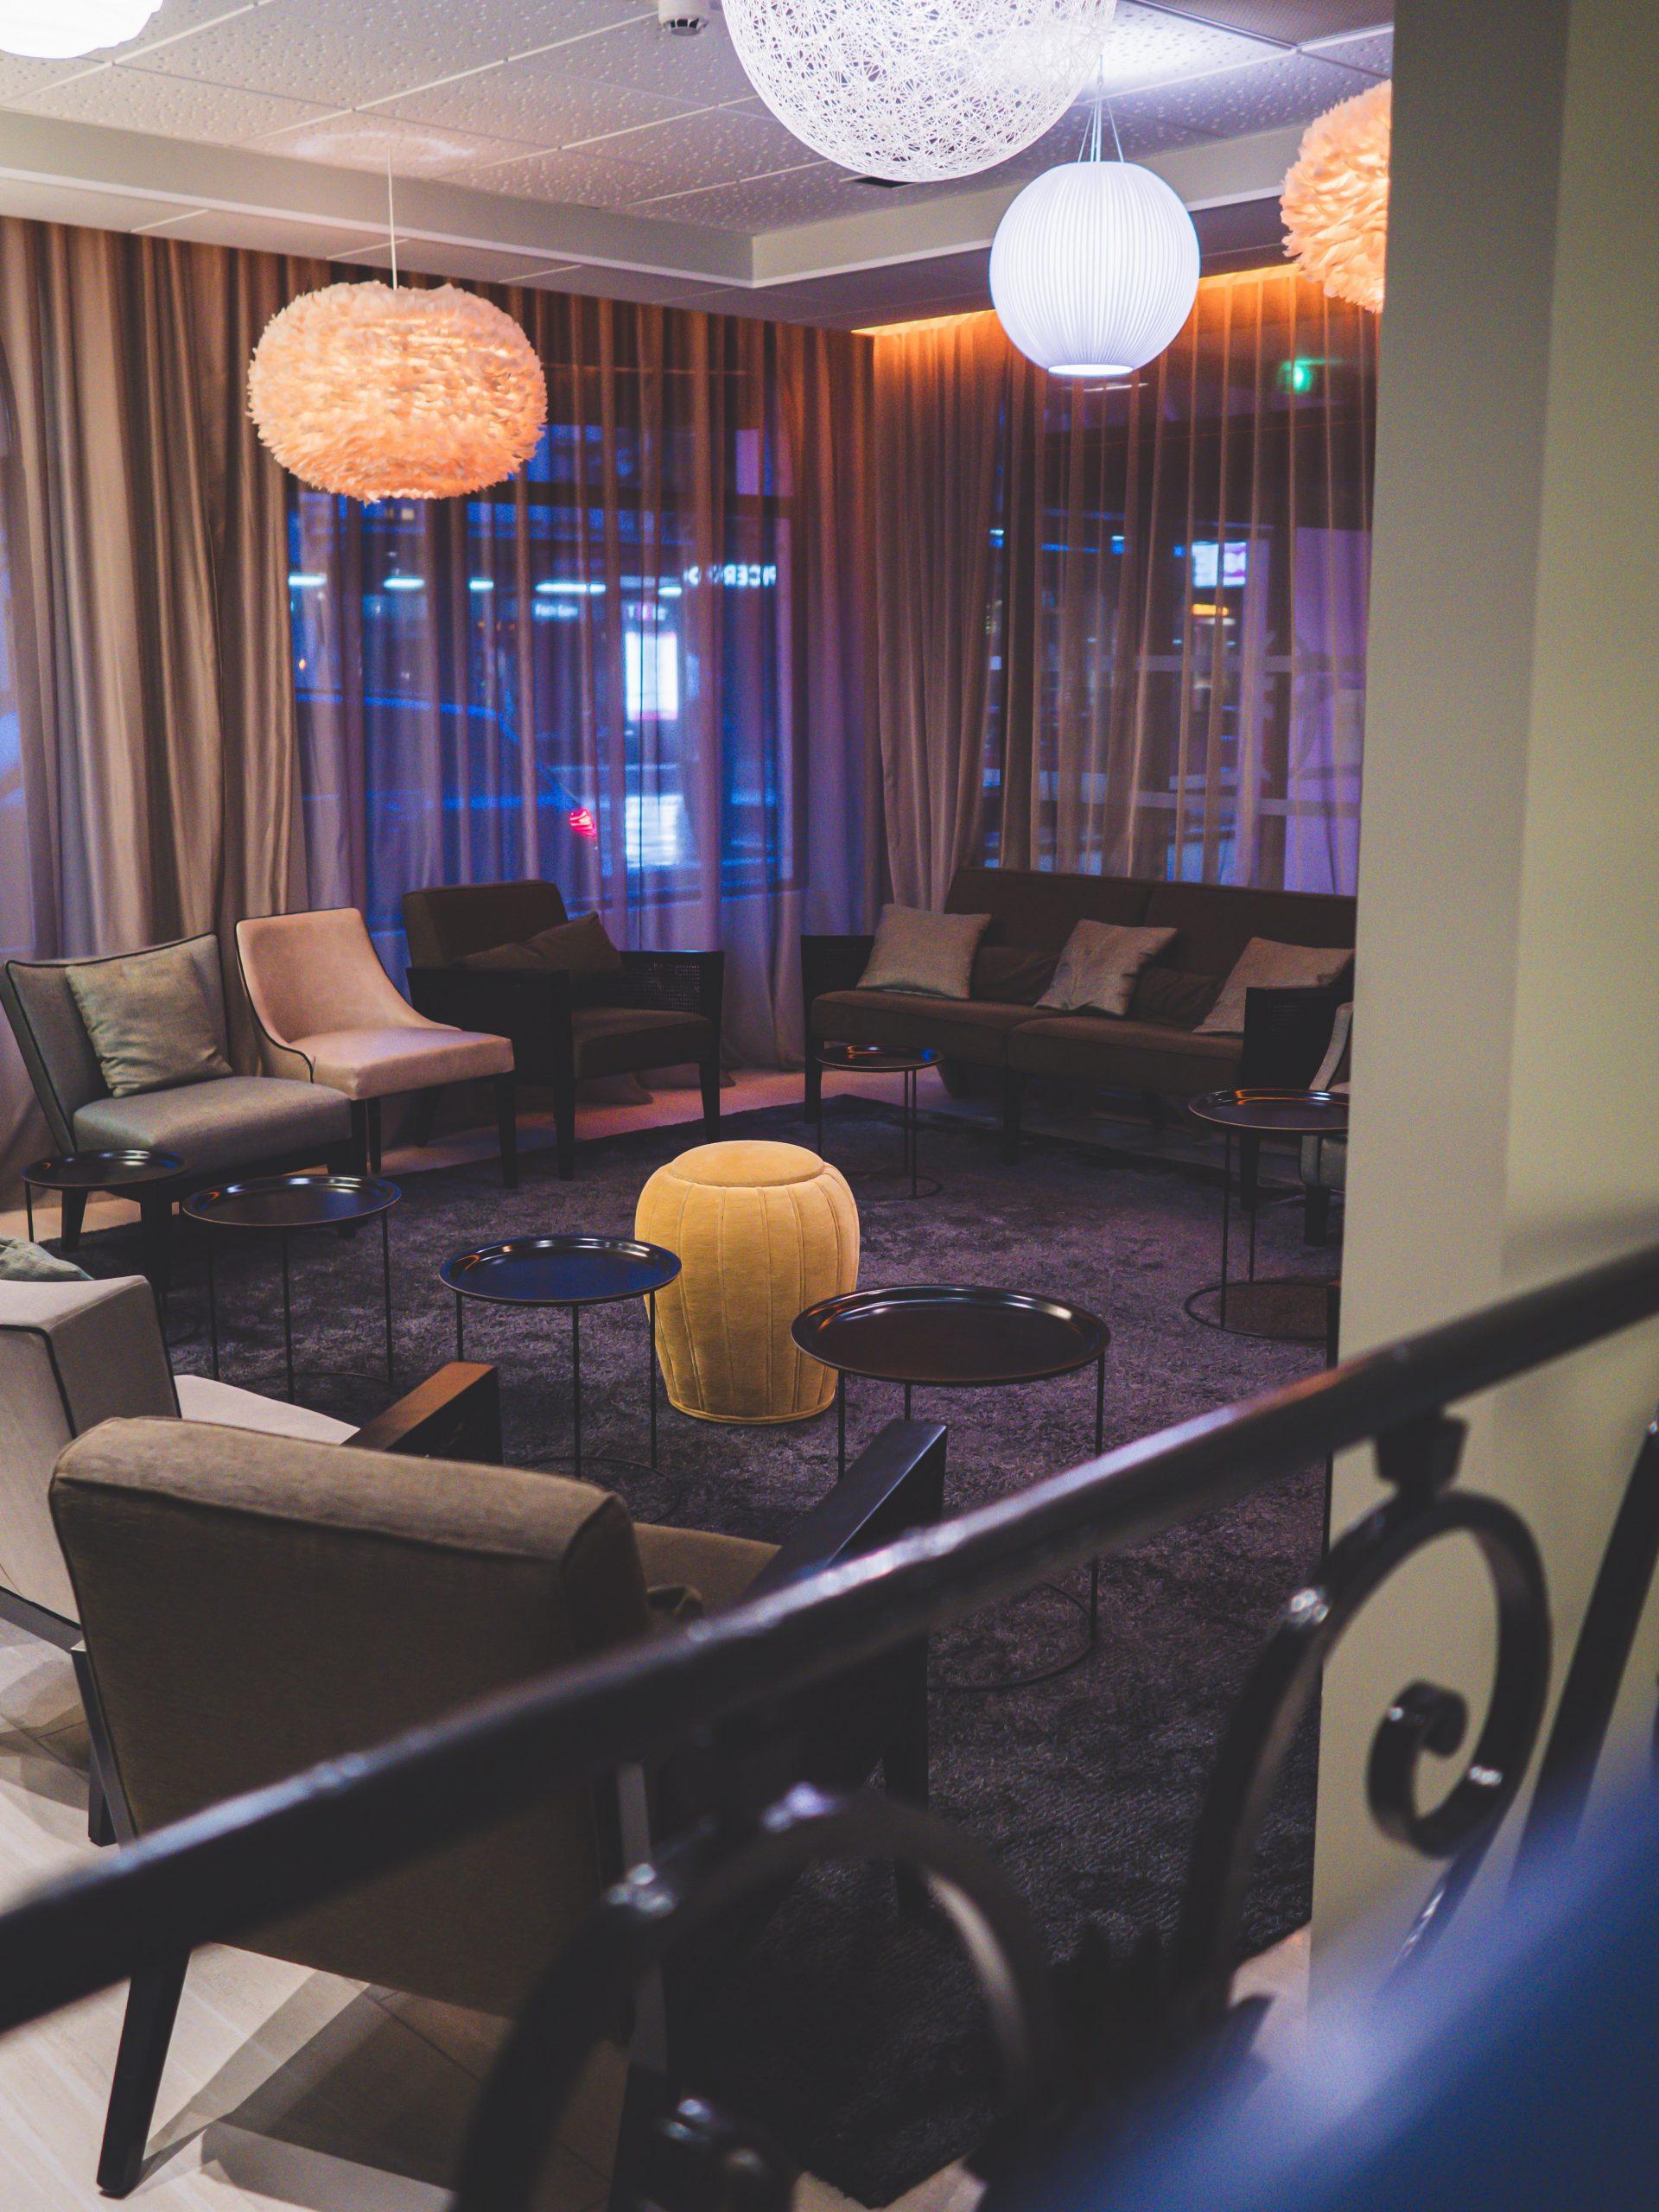 Salon commun de l'hôtel Le Jura à Dijon - Océania